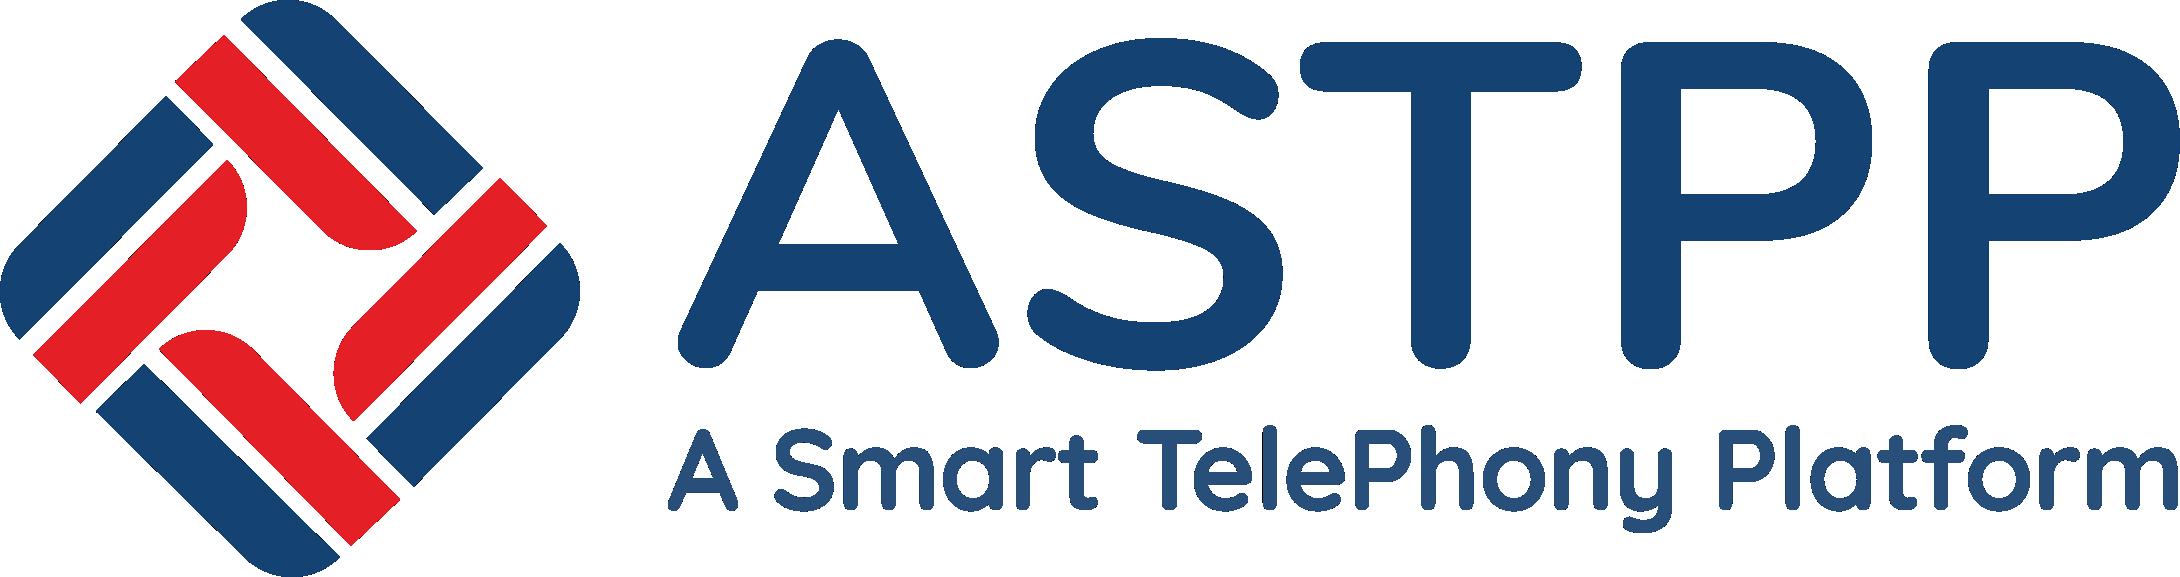 ASTPP - Open Source Voip Billing Solution